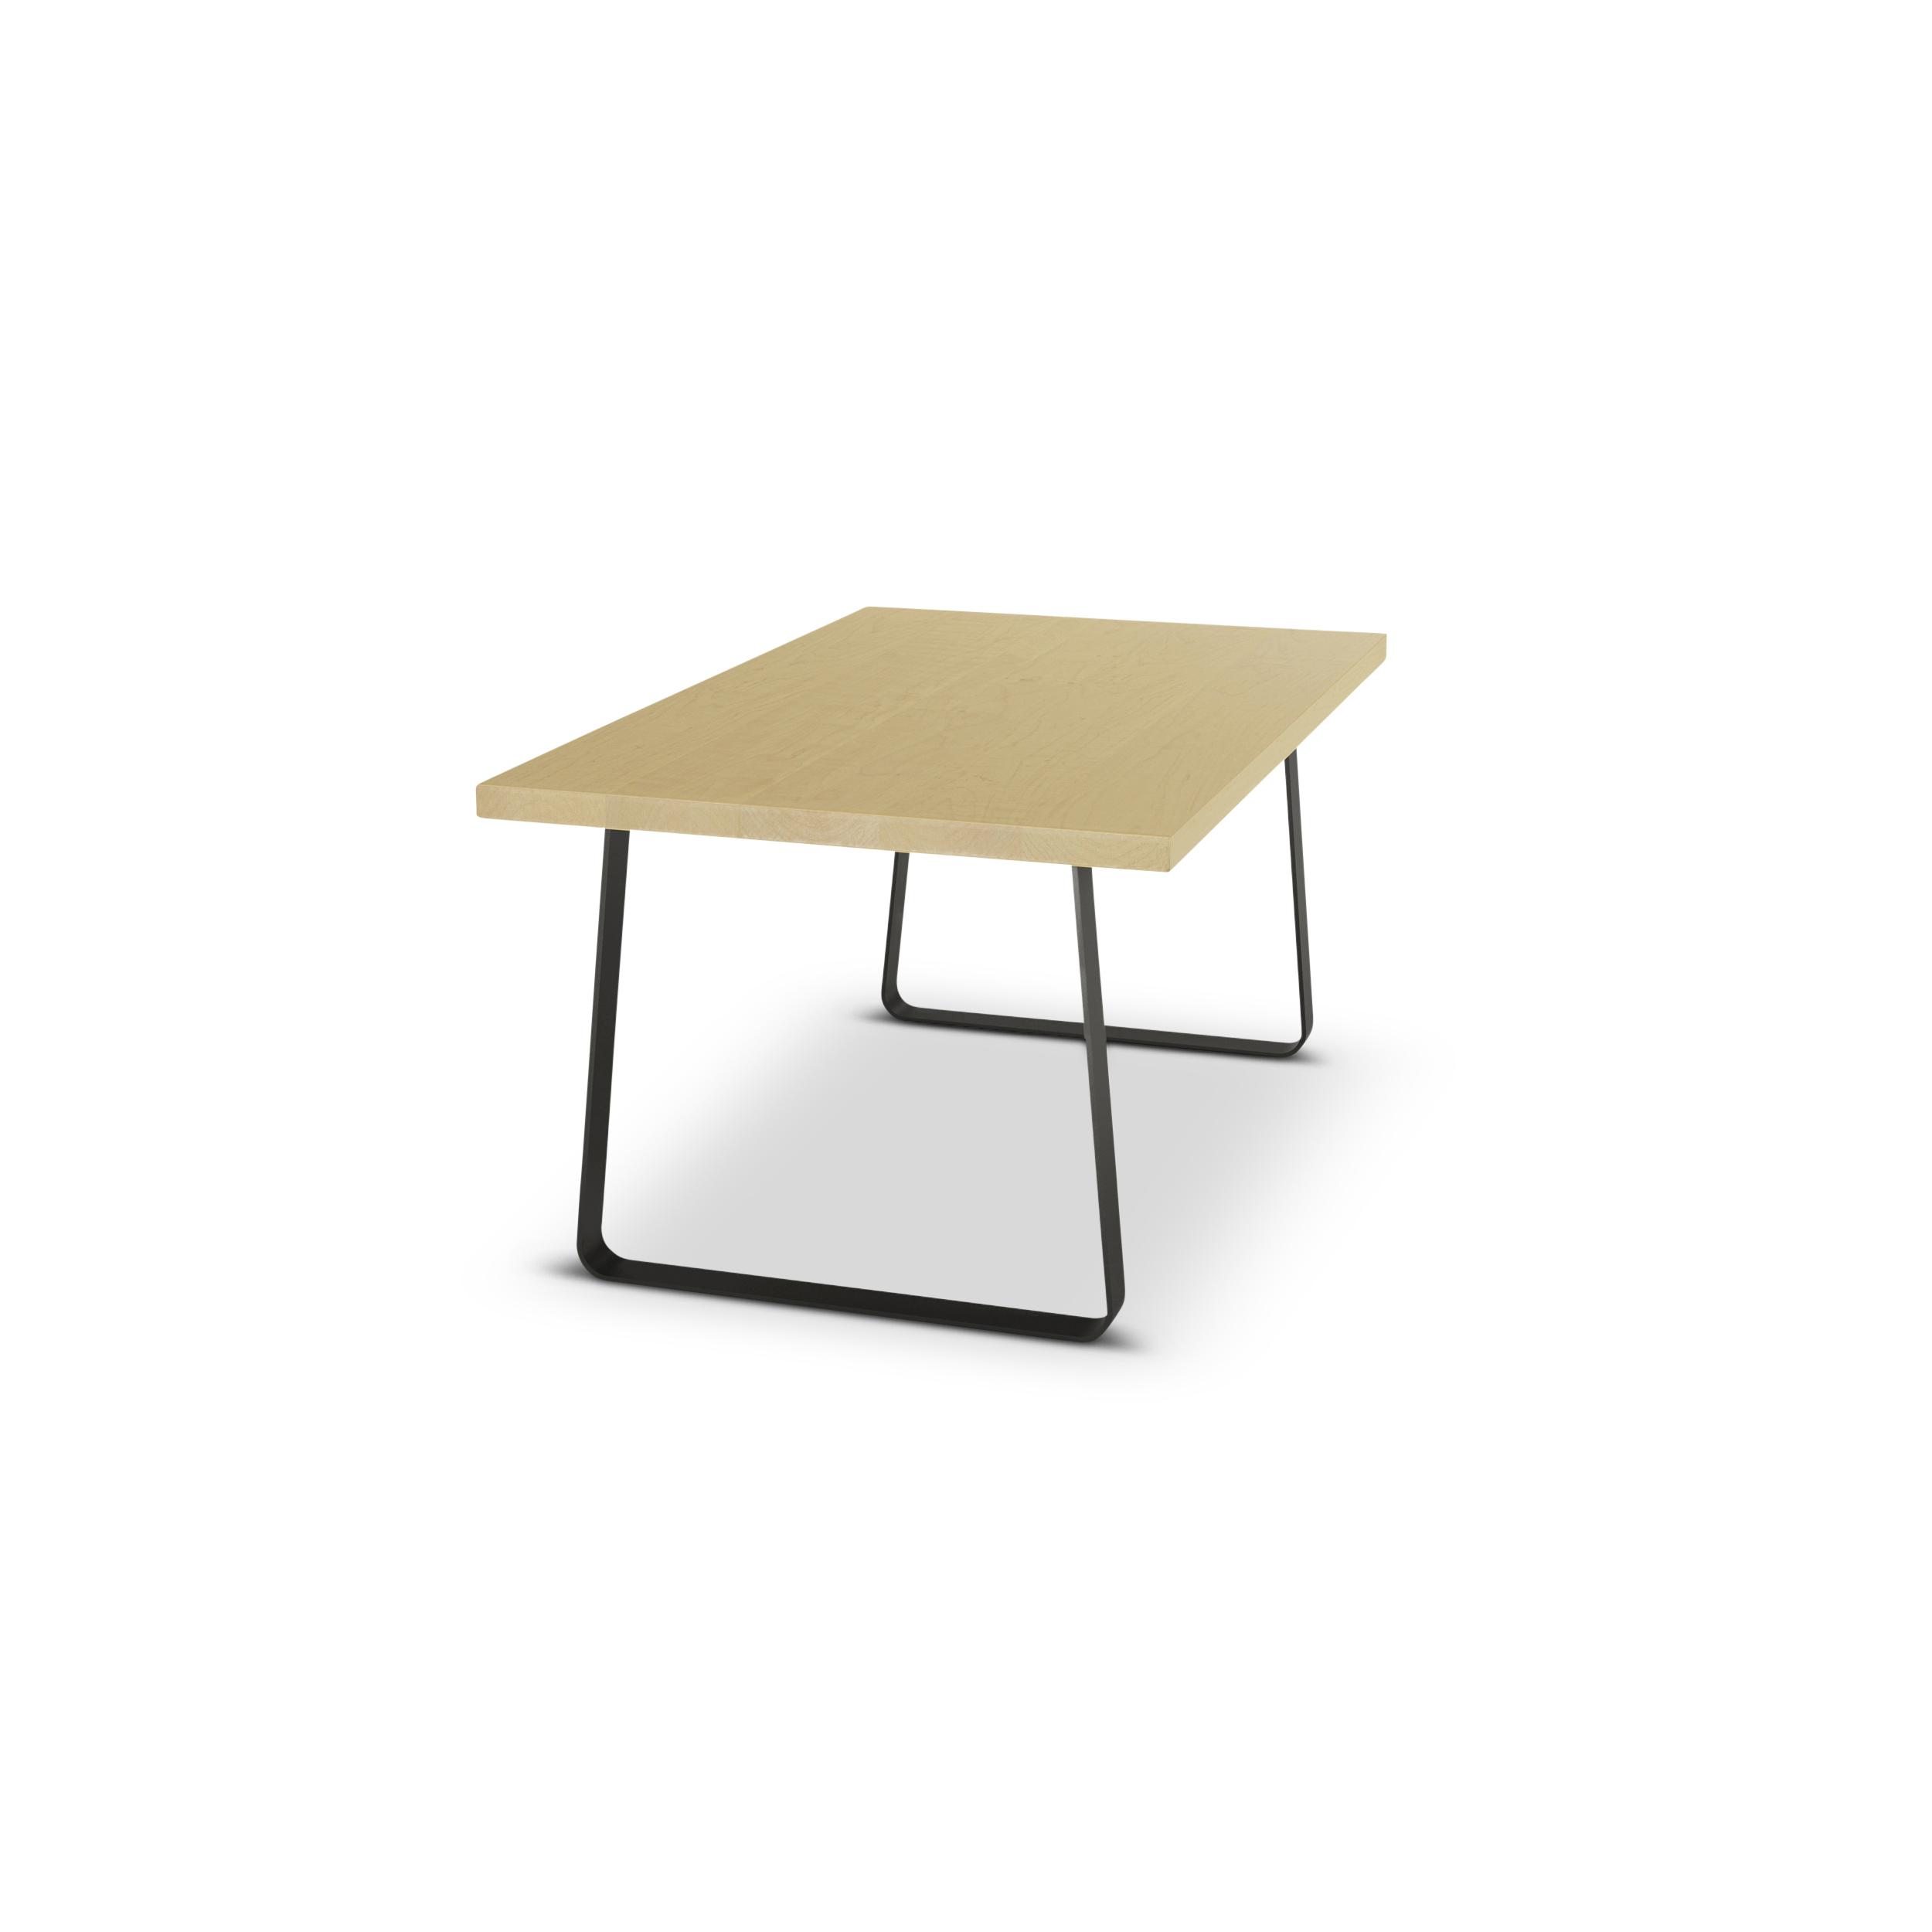 "Maple Jern 66"" Table"